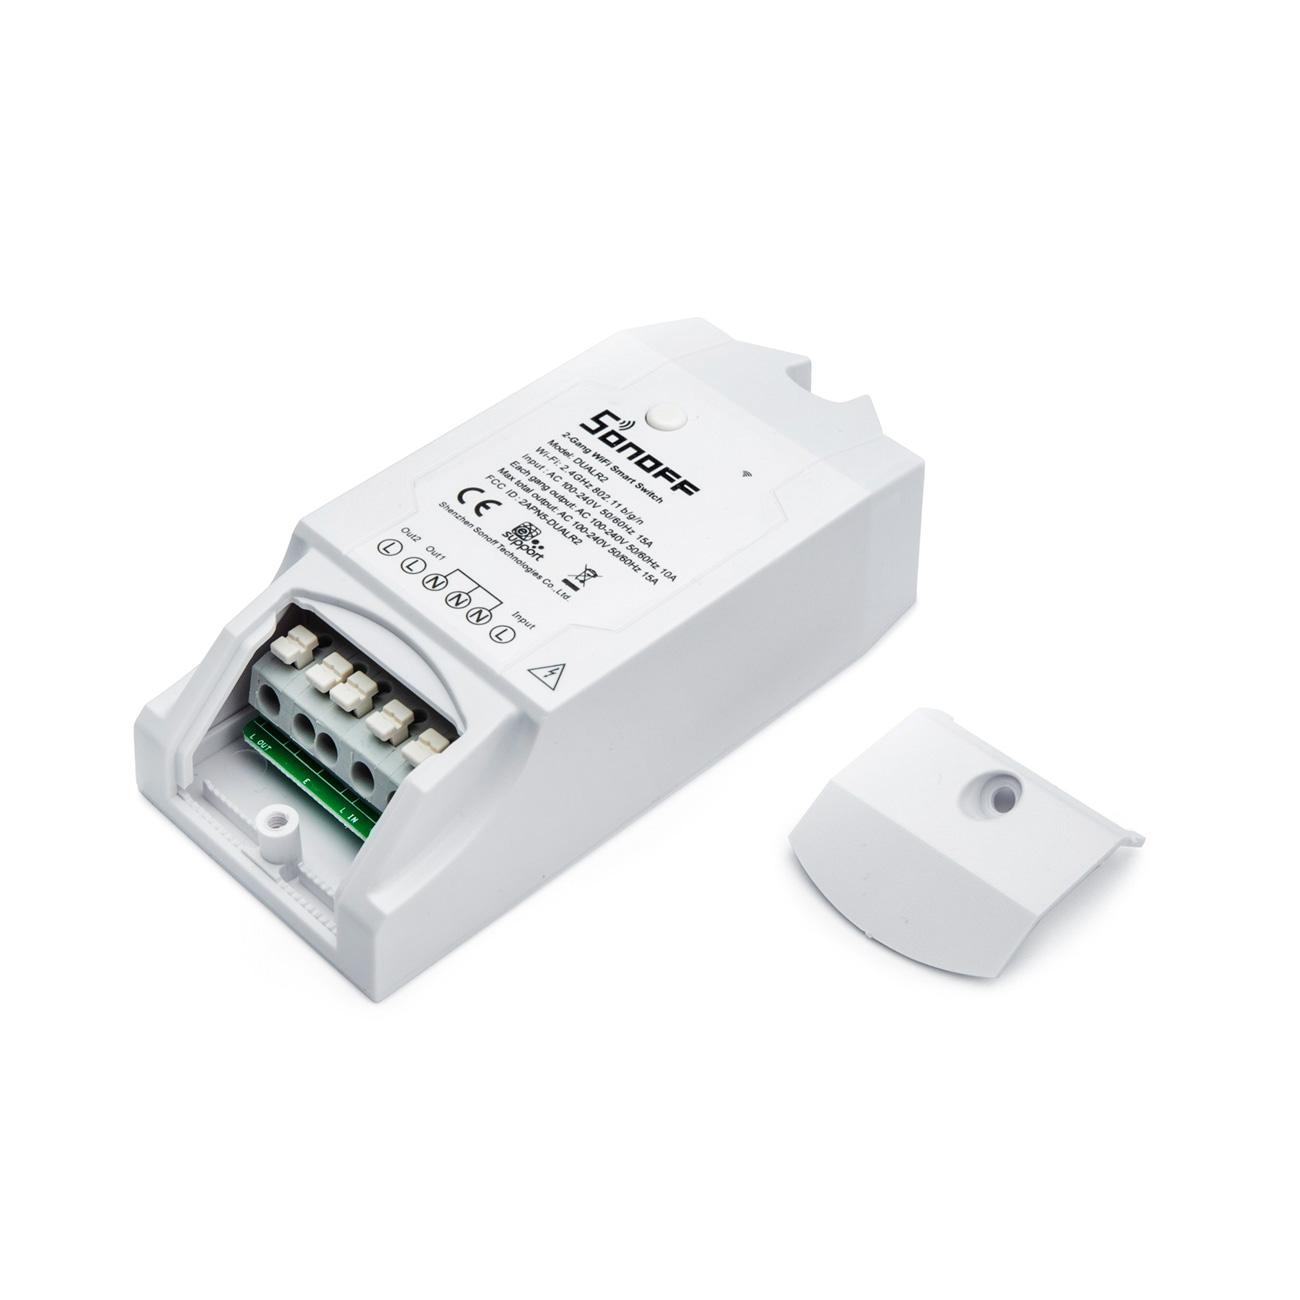 Sonoff Dual Channel DIY WIFI dvoukanalový programovatelný modul 15A/230V